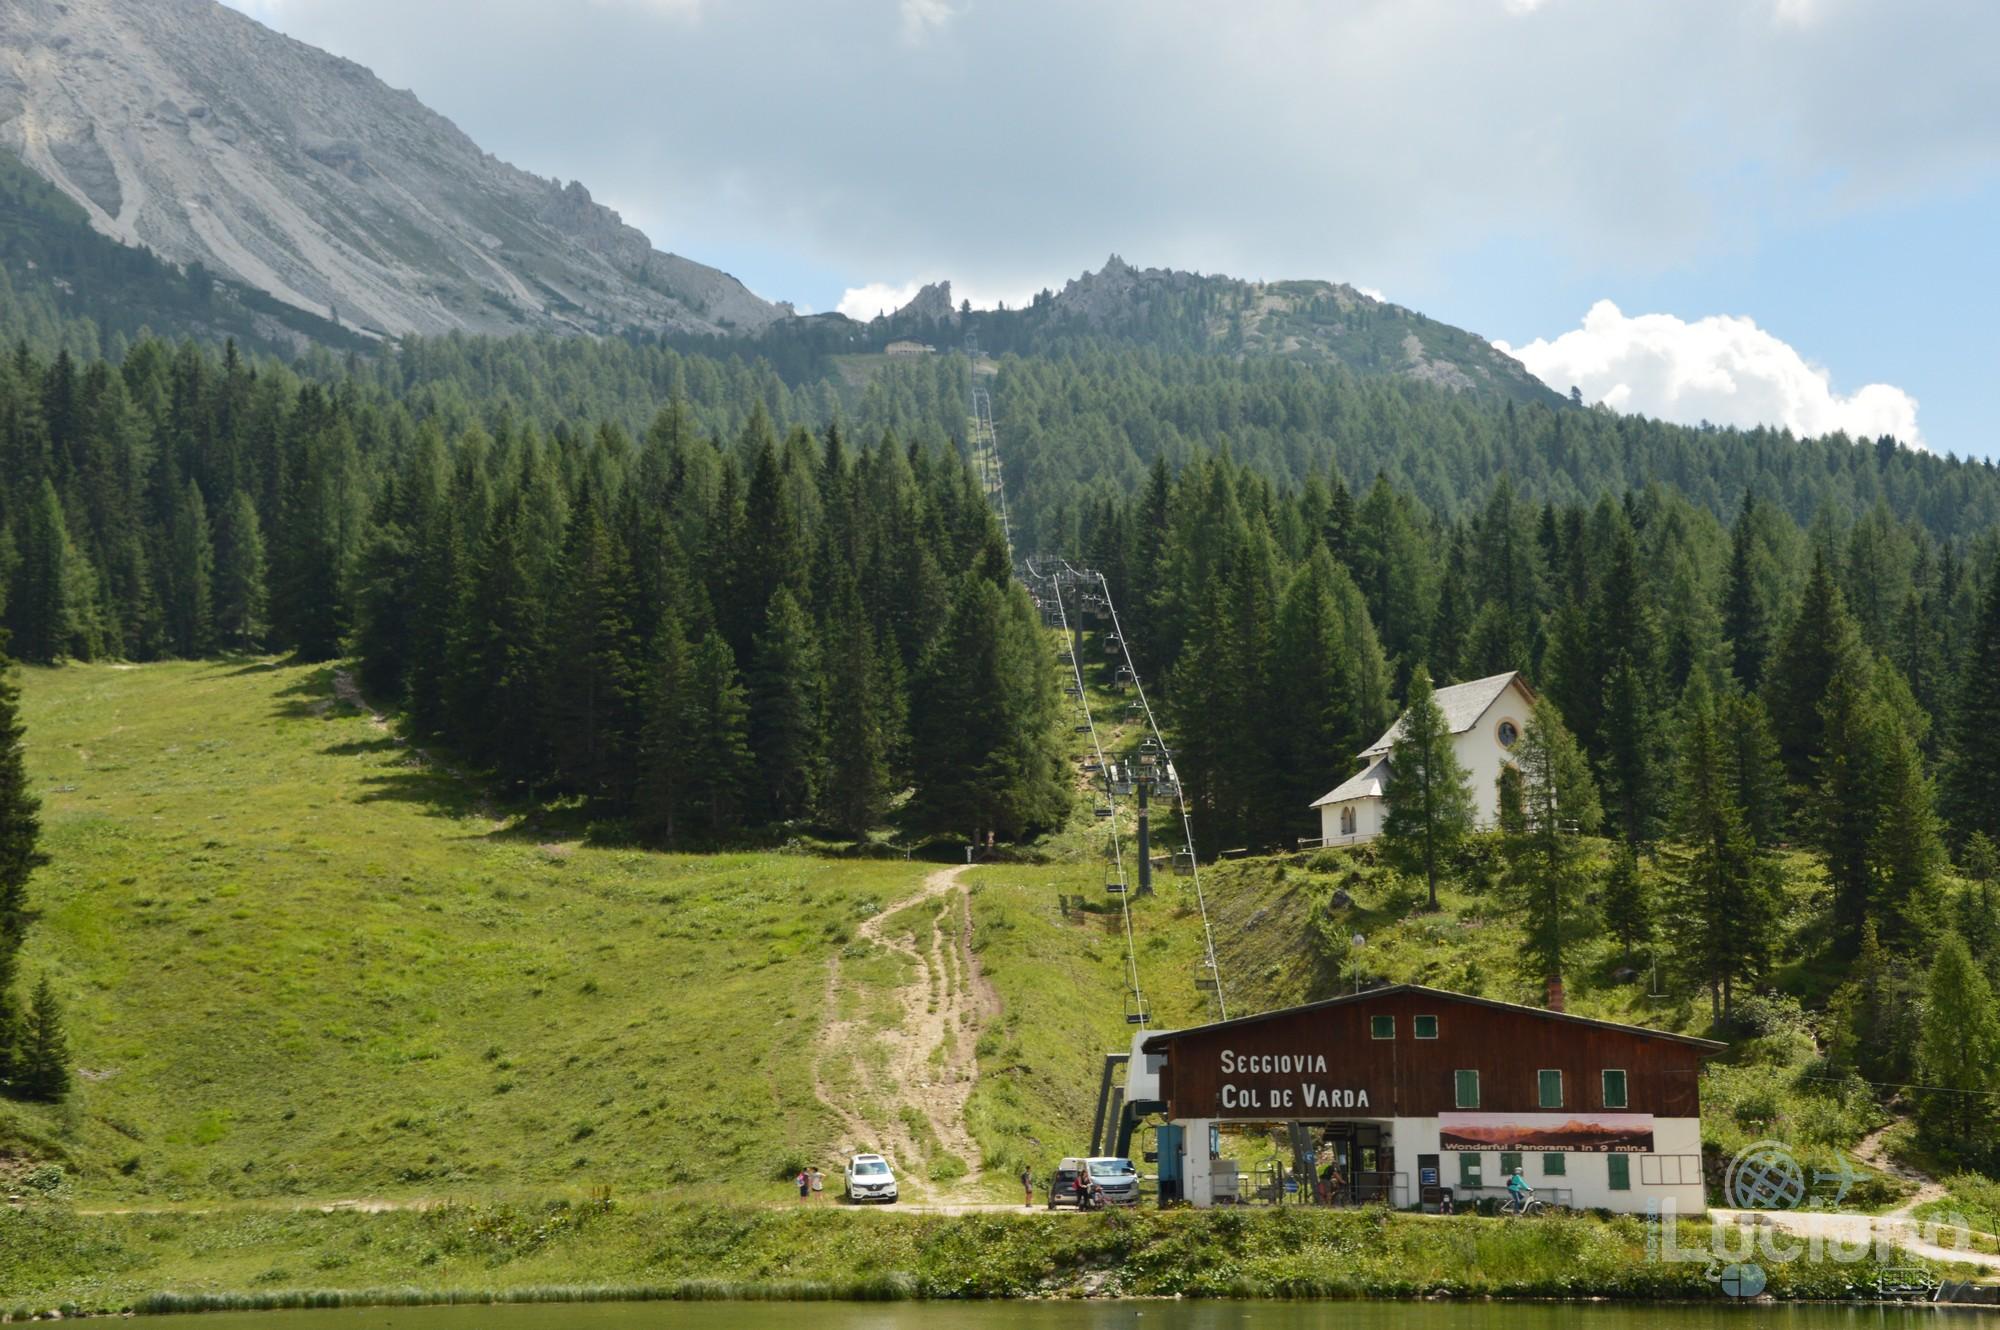 Seggiovia Col de Varda - Lago di Misurina - Veneto